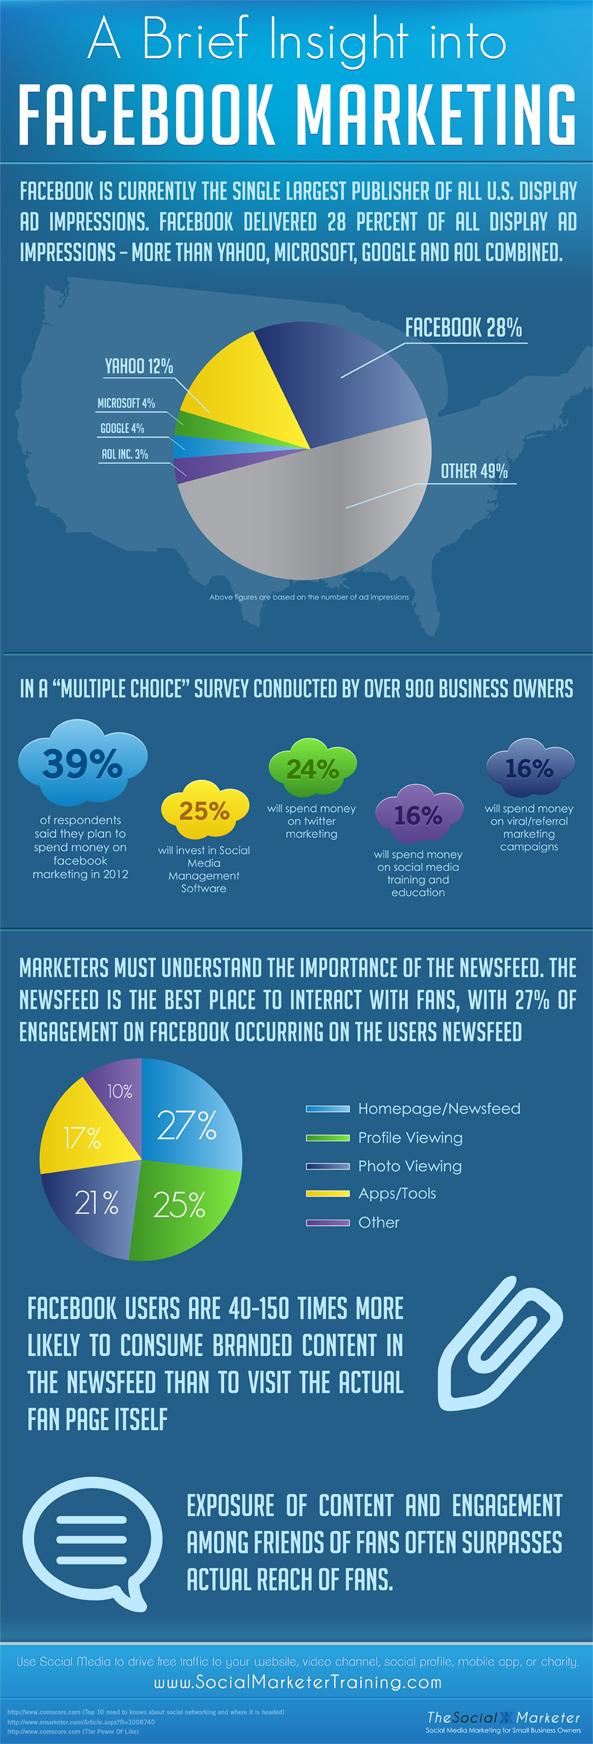 Insight into Facebook marketing